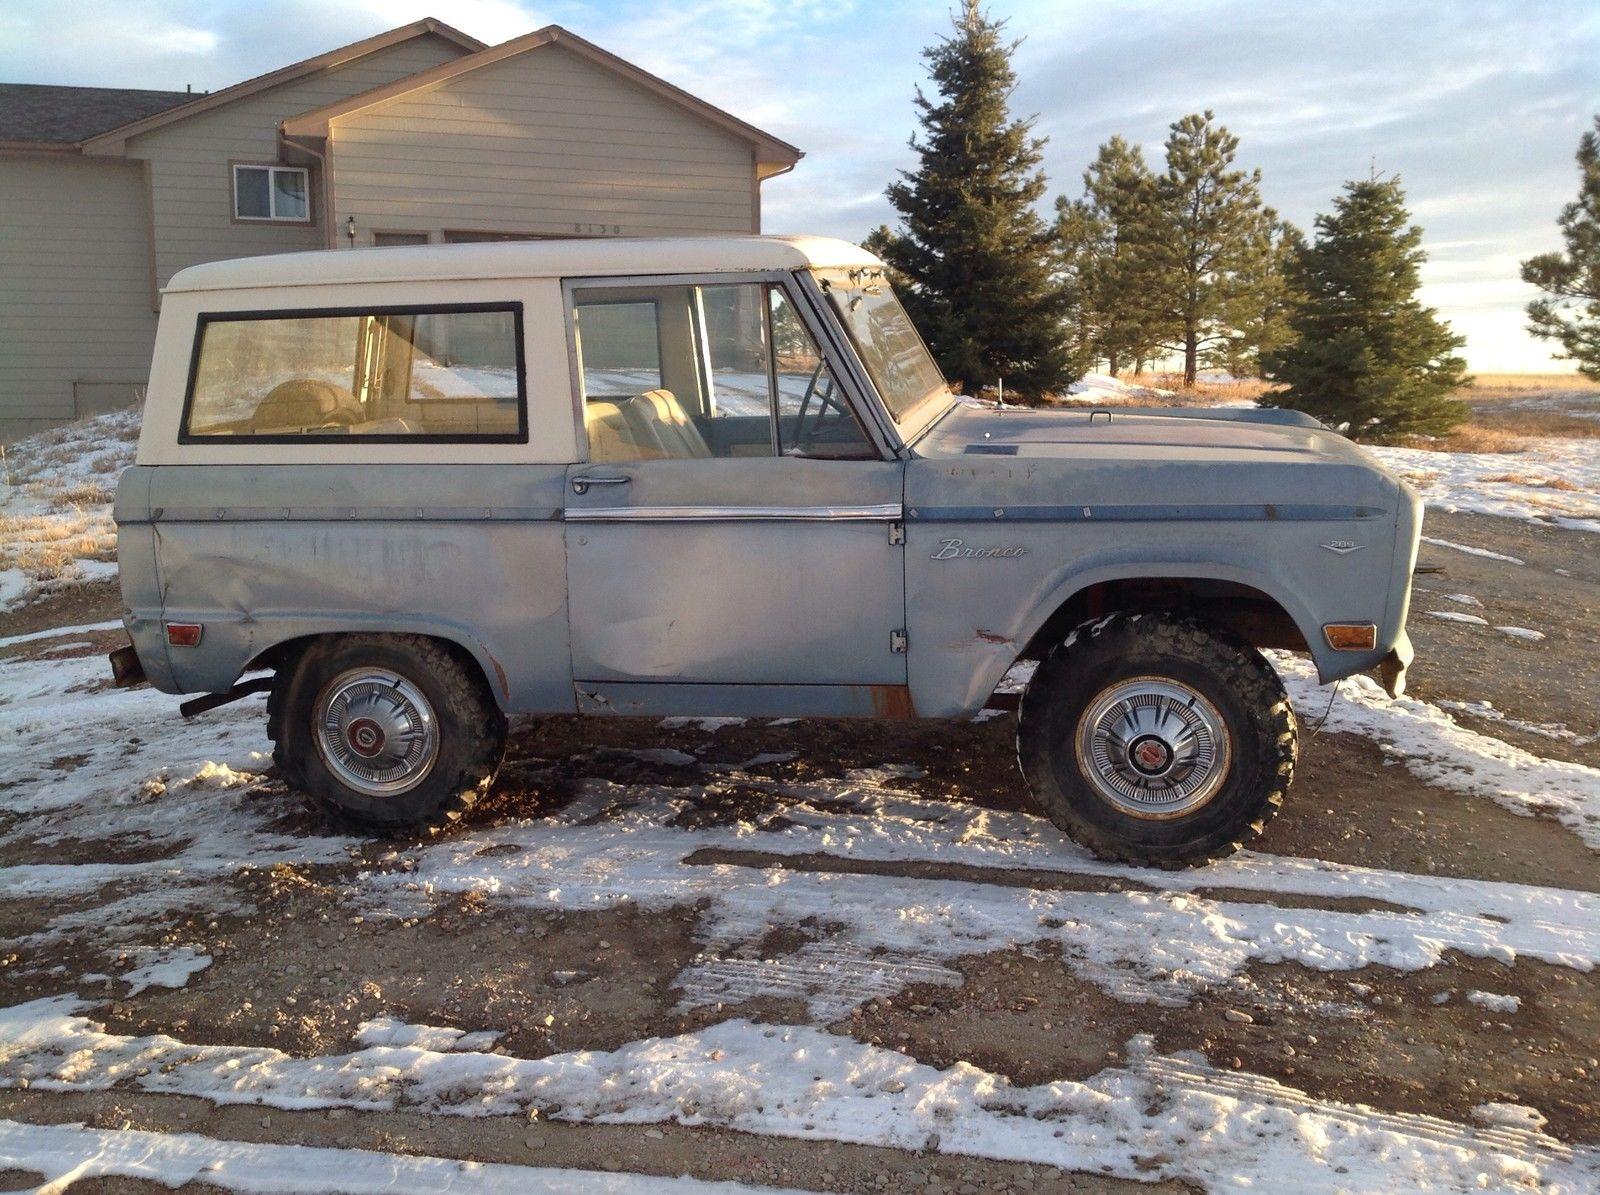 1968 ford bronco uncut original survivor 289 brittany blue 56,000 original  miles